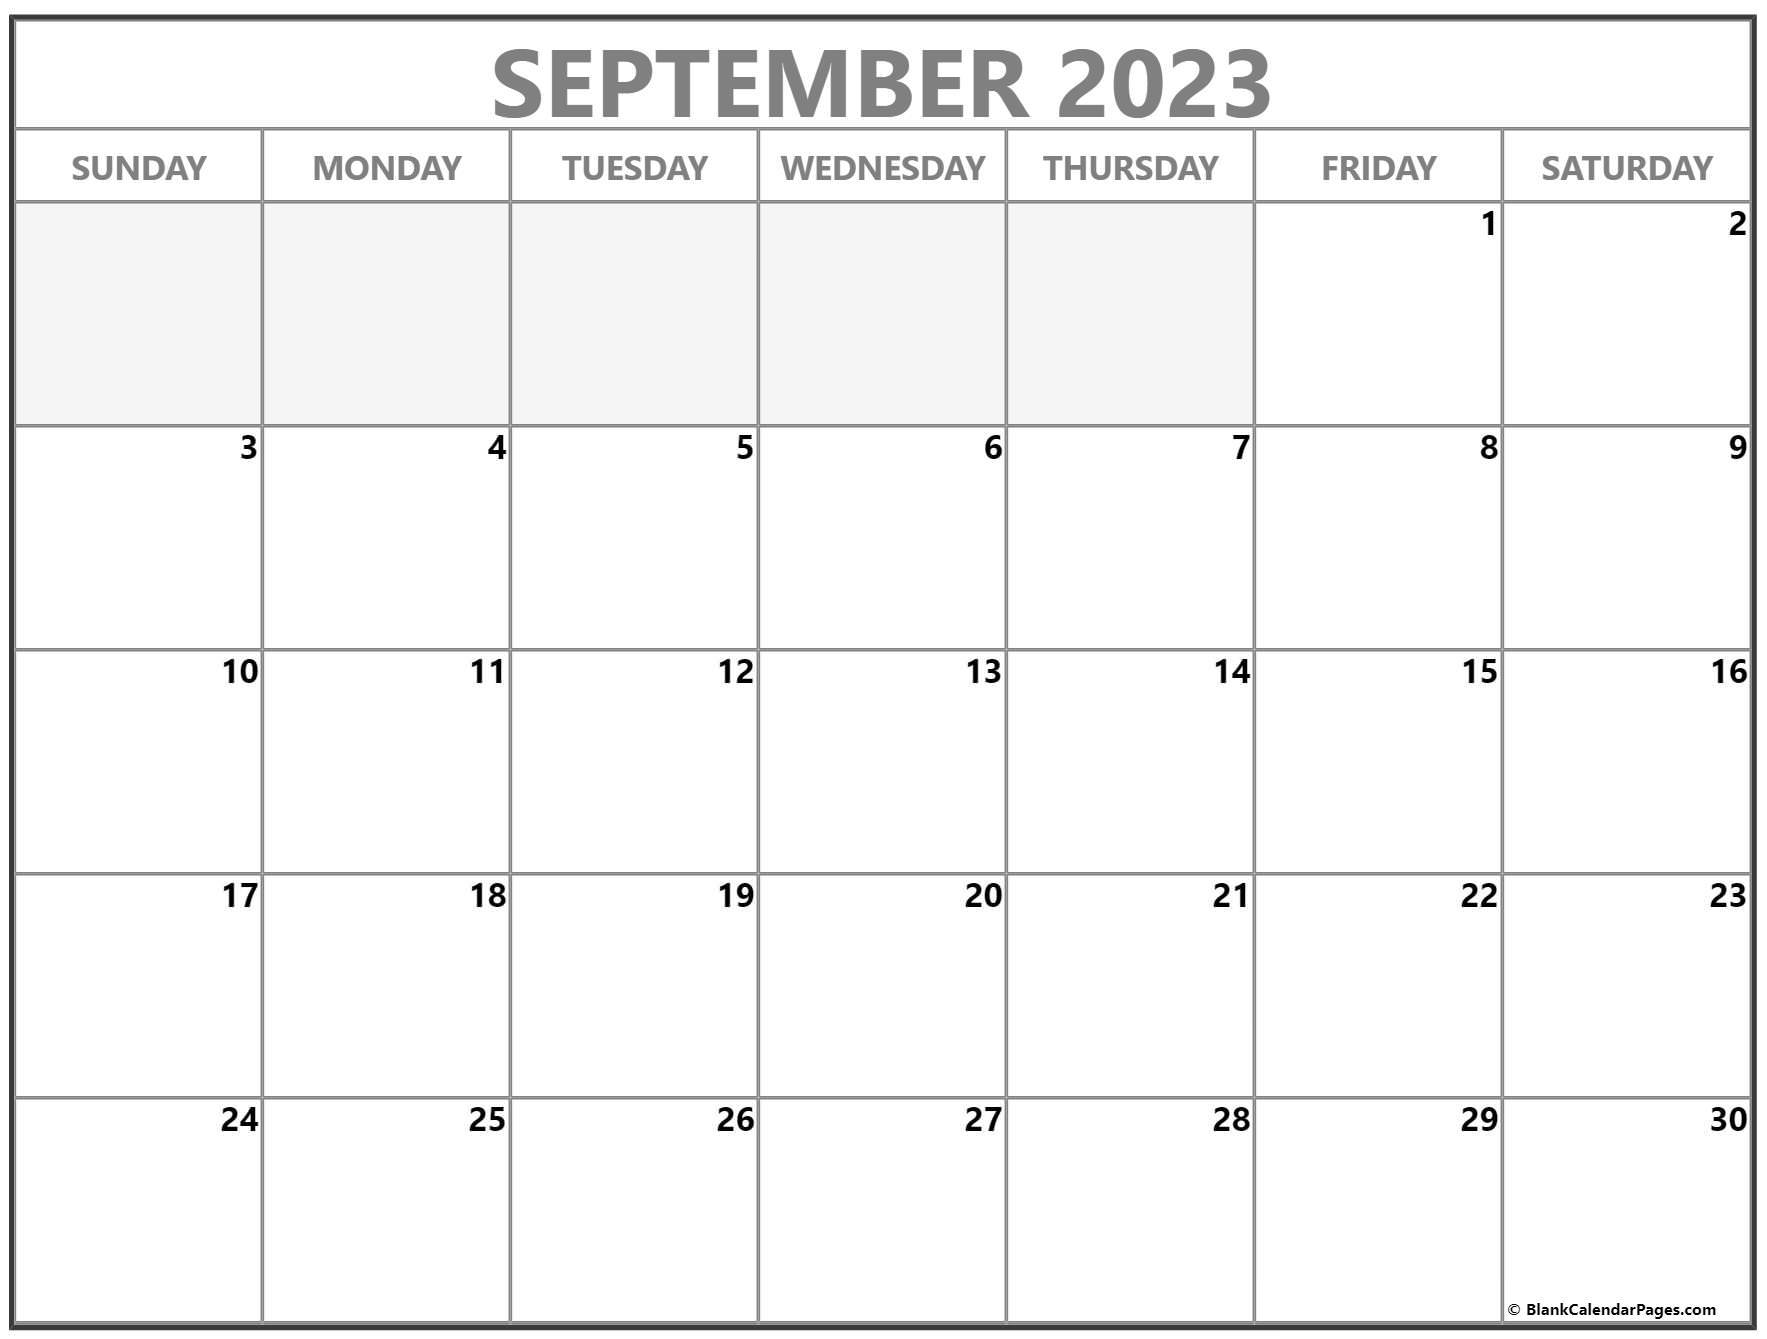 September 2022 calendar | free printable calendar templates